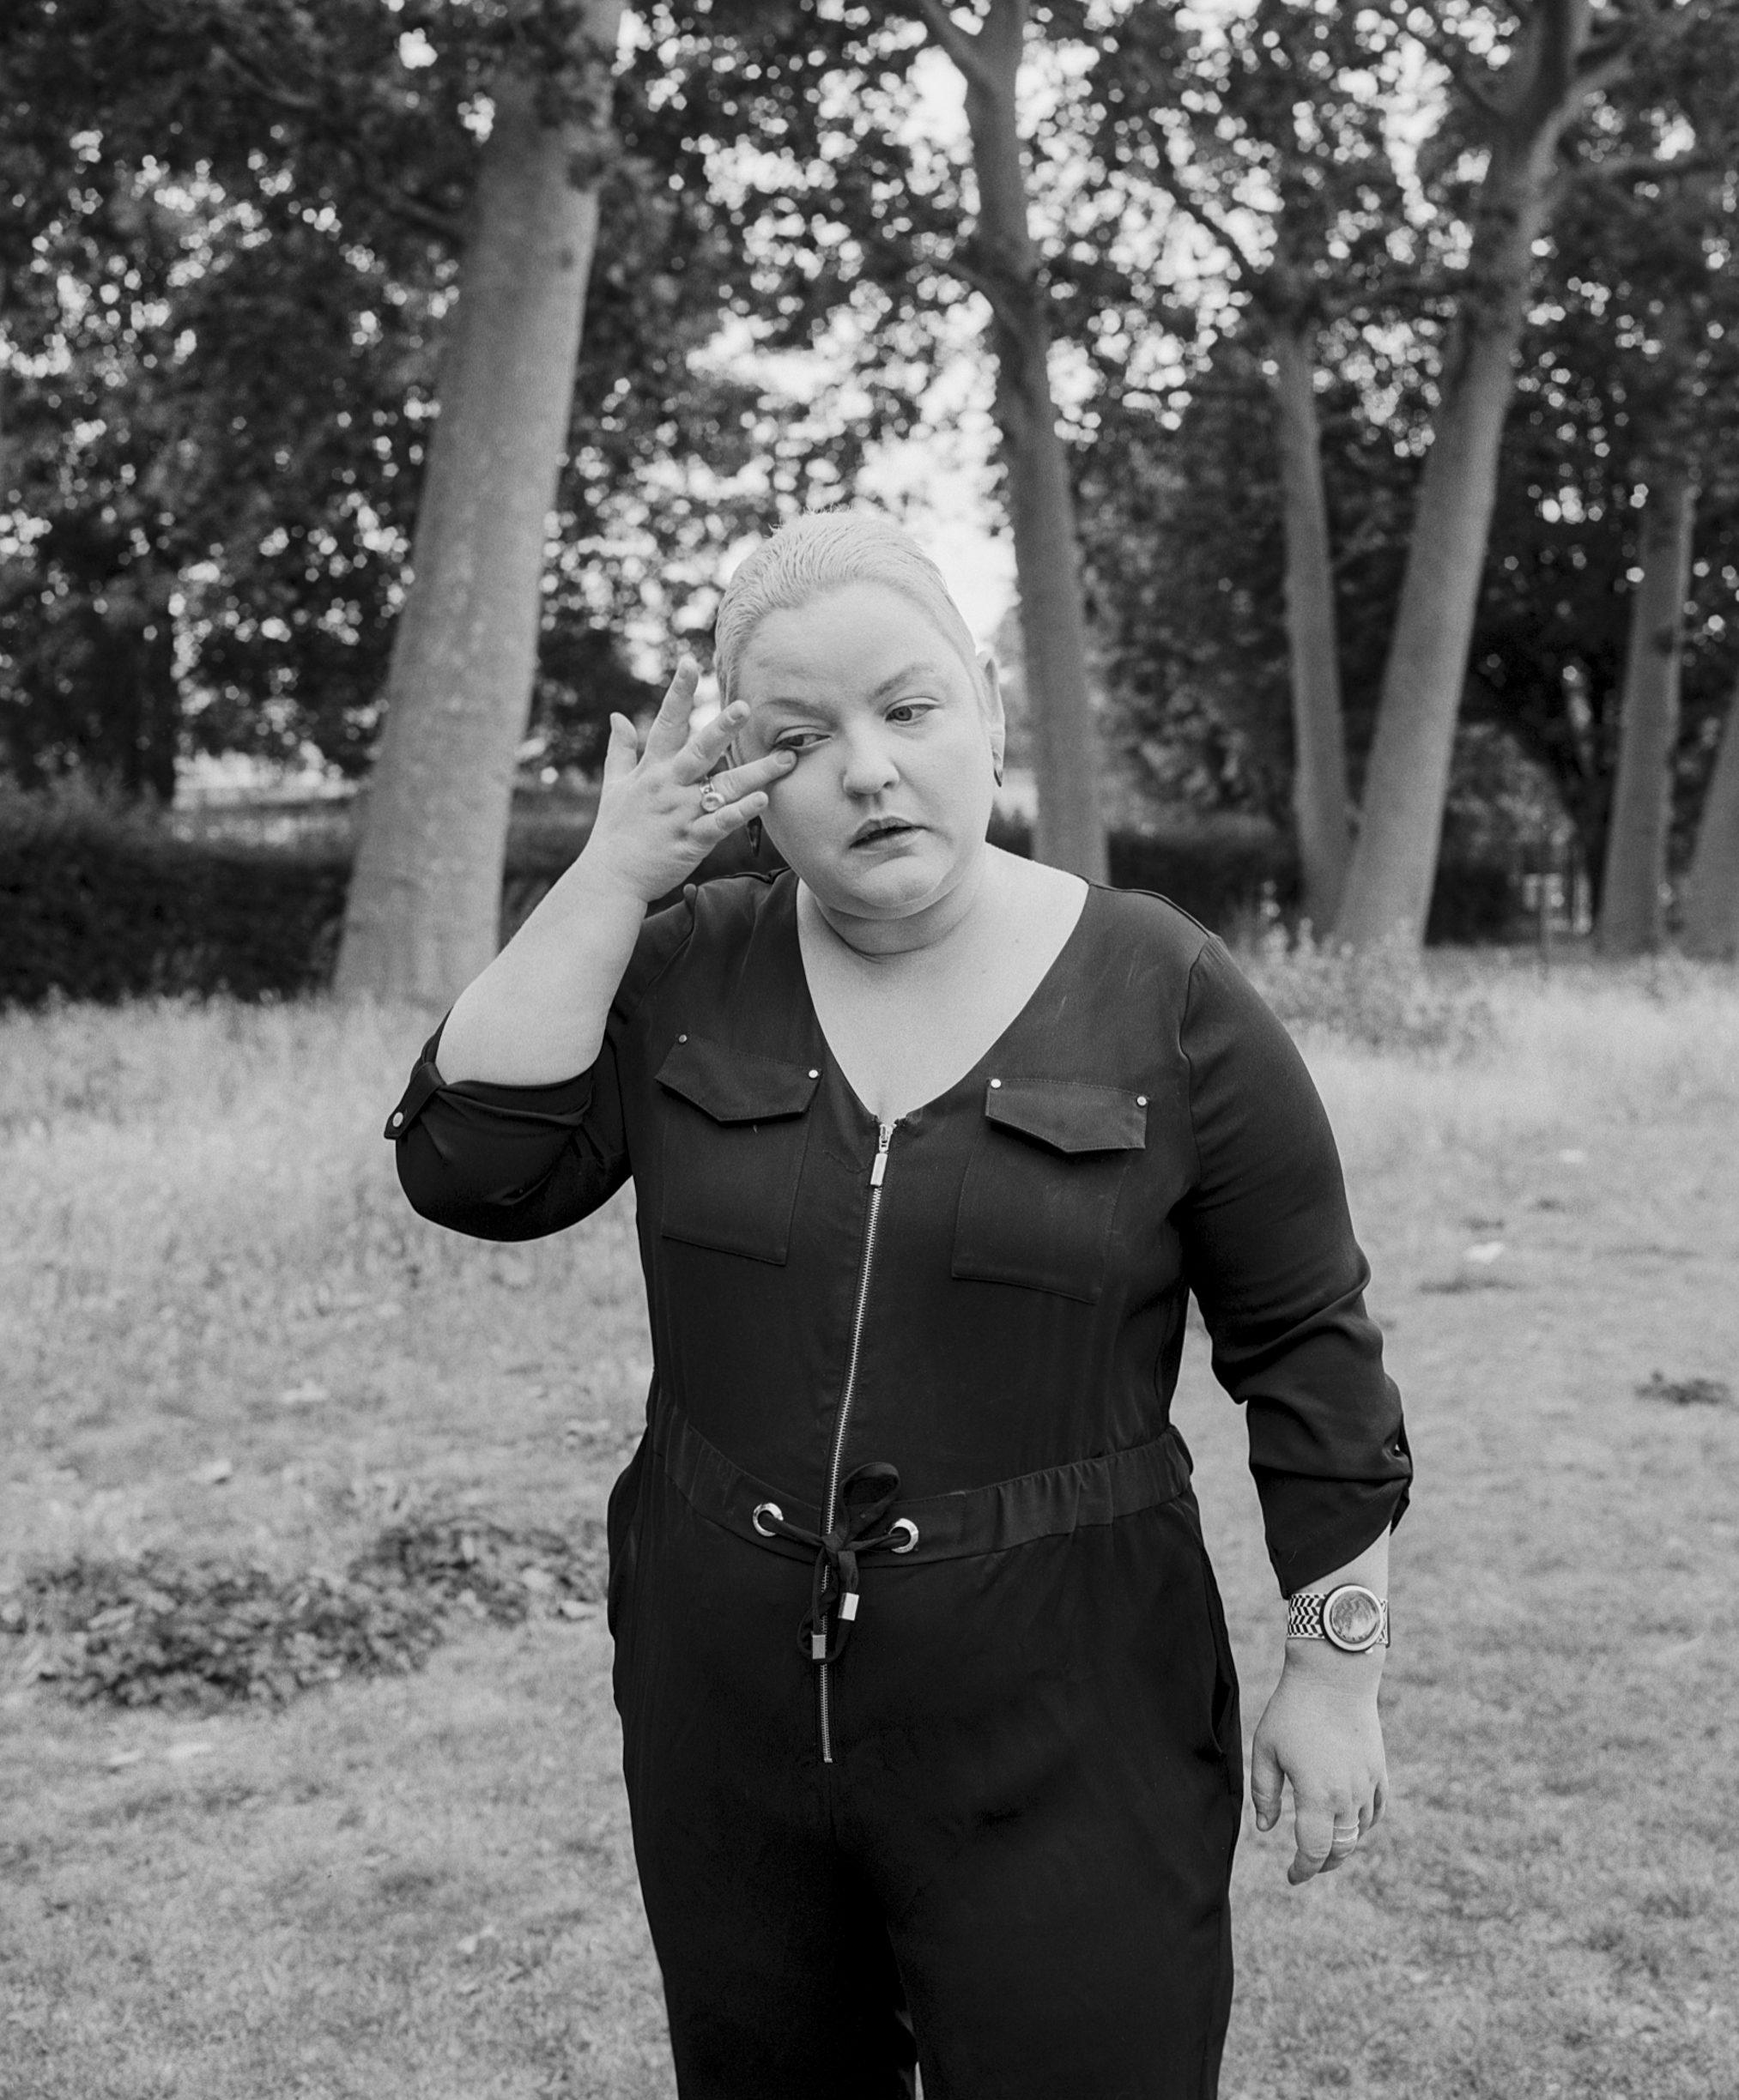 Lynne-IOD-ioanamarinca shot on ILFORD HP5 Black and white film